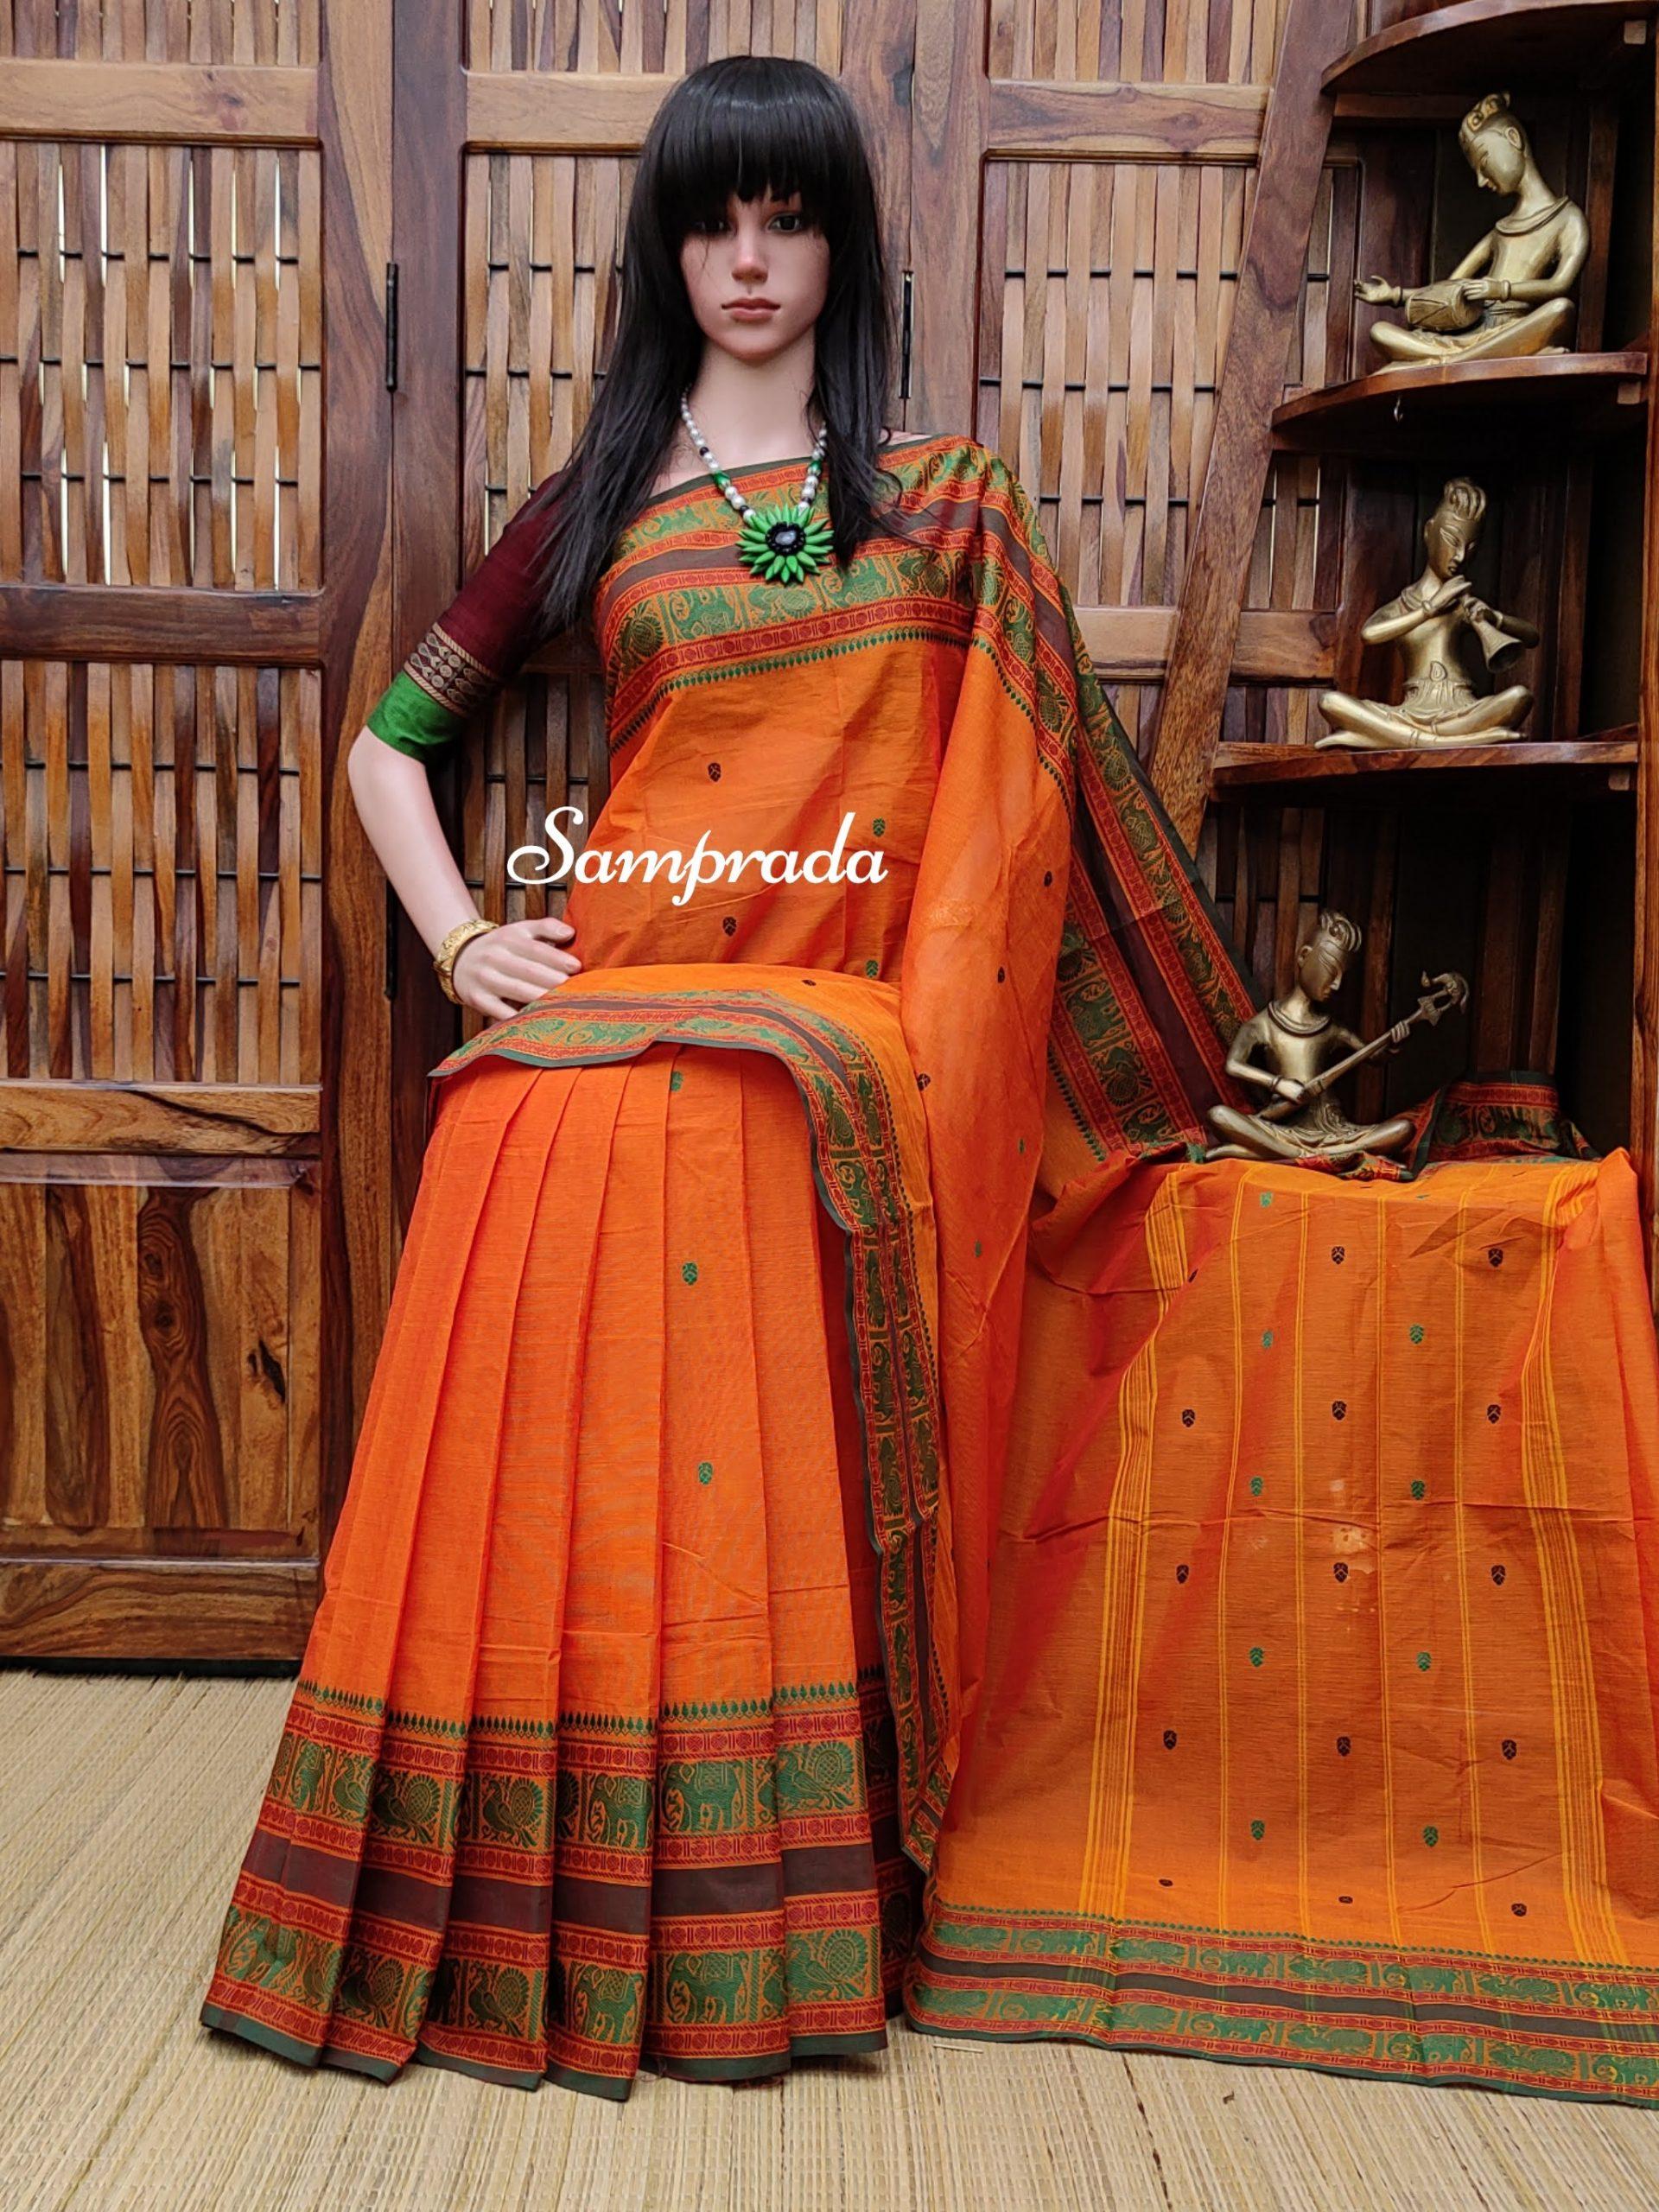 Sanskrithi - South Cotton Saree